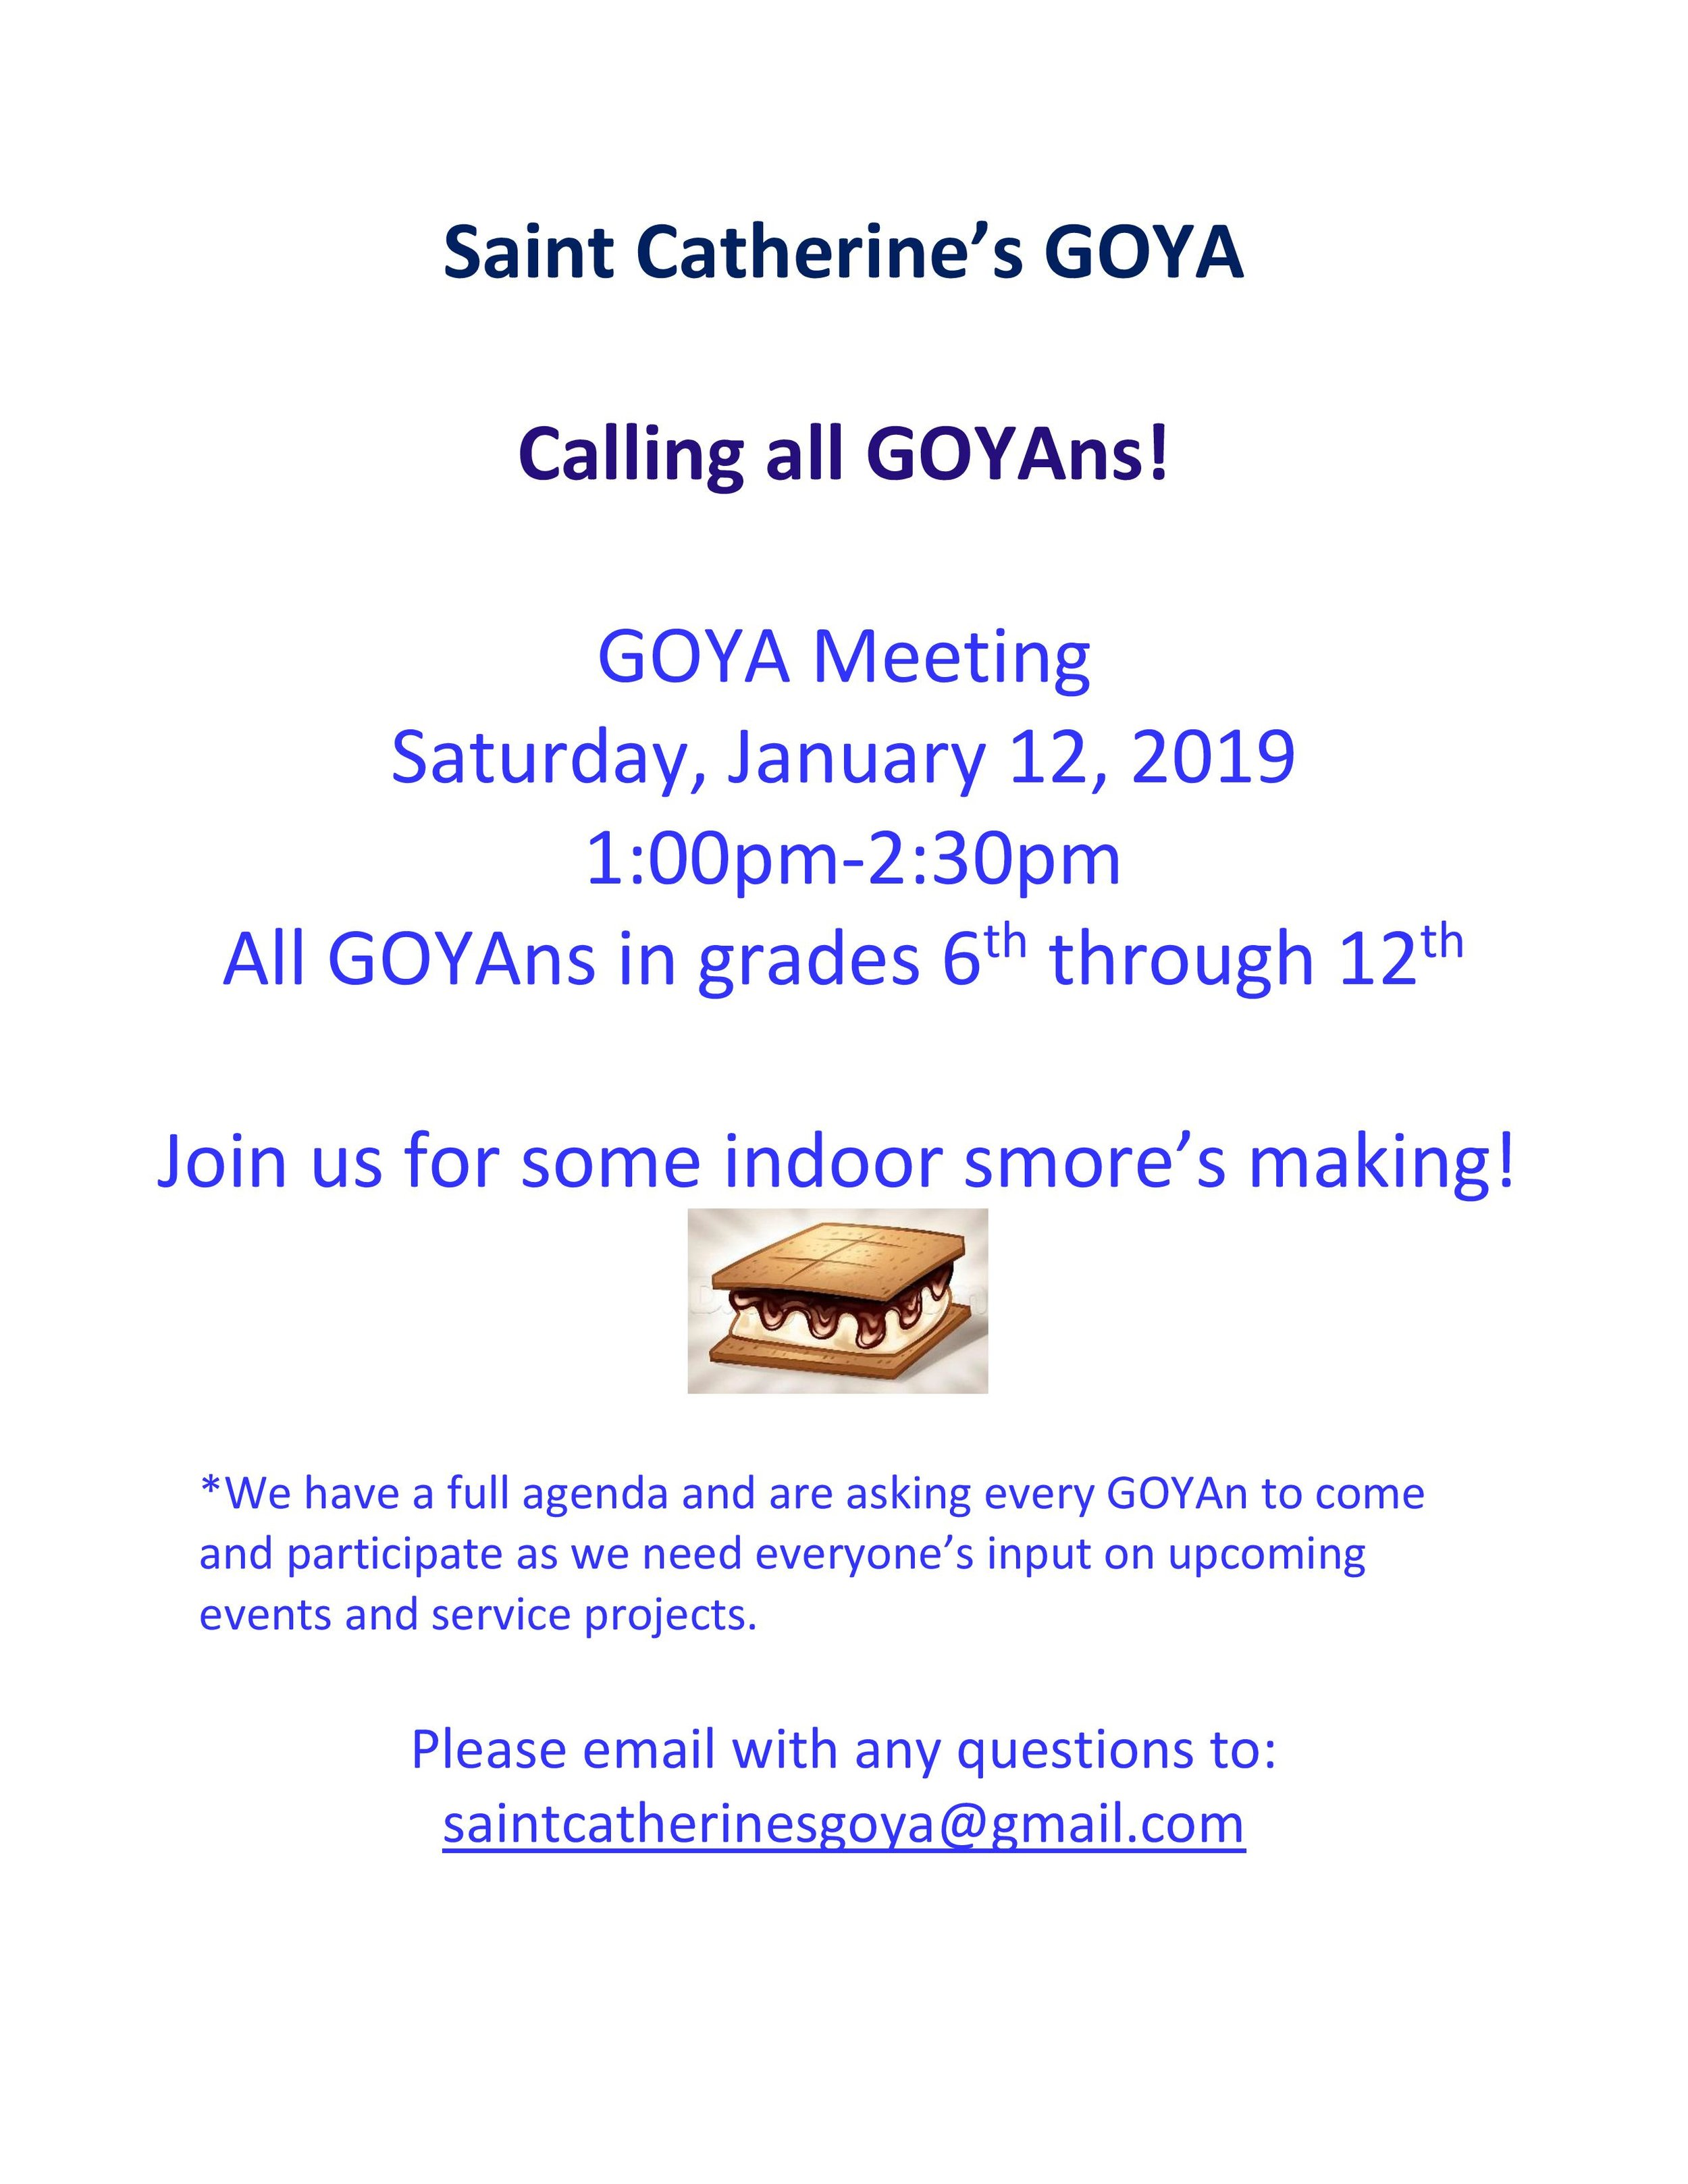 January GOYA Meeting Flyer-page-001.jpg